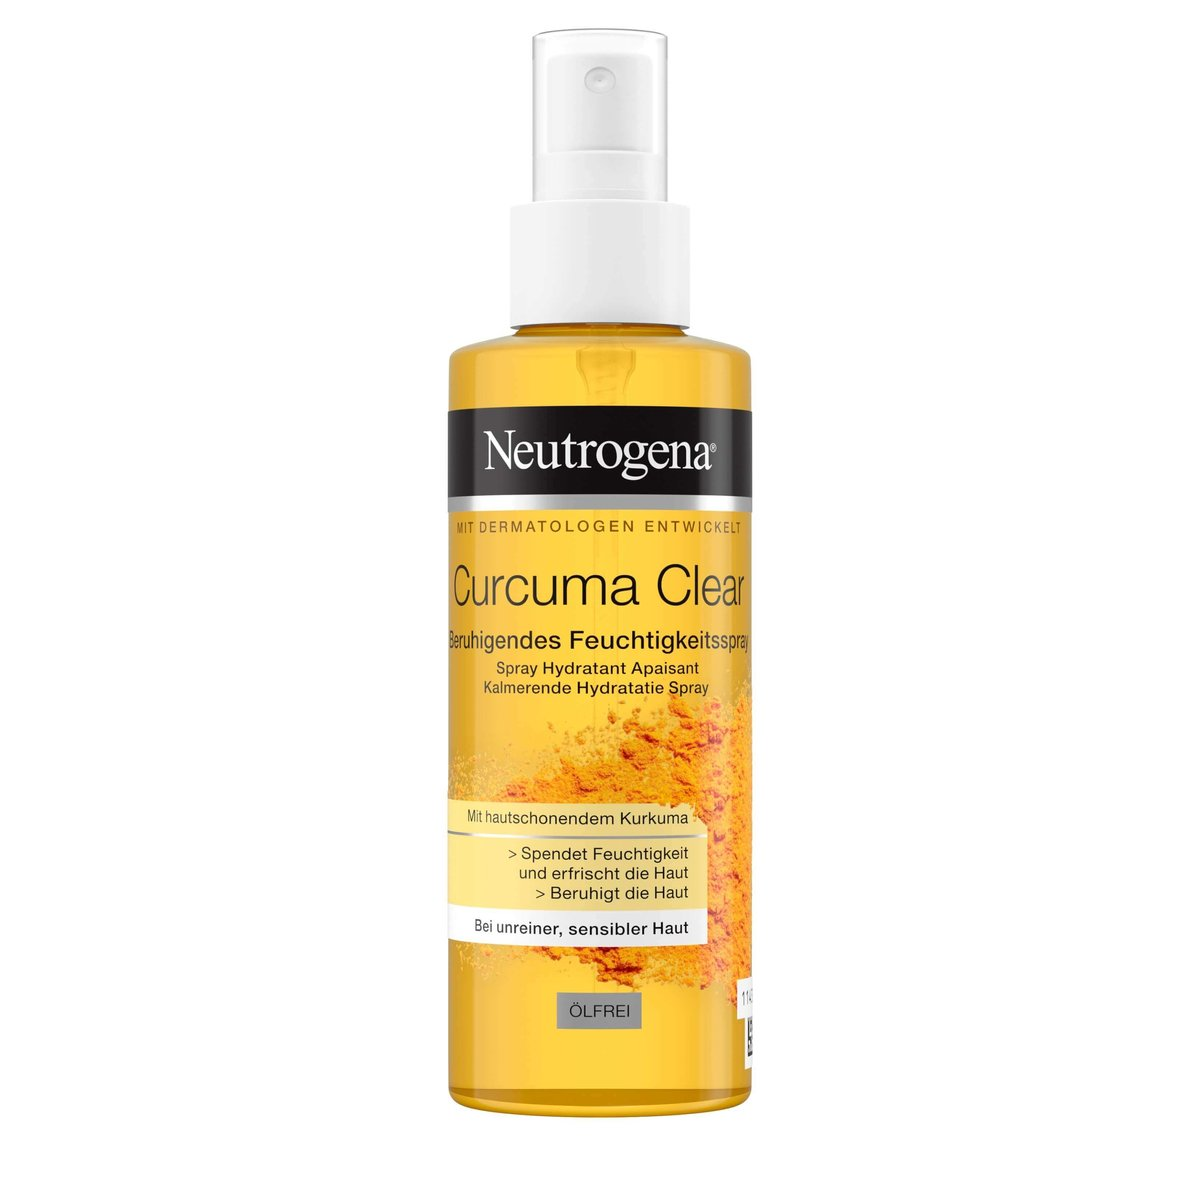 Curcuma Clear Beruhigendes Feuchtigkeitsspray